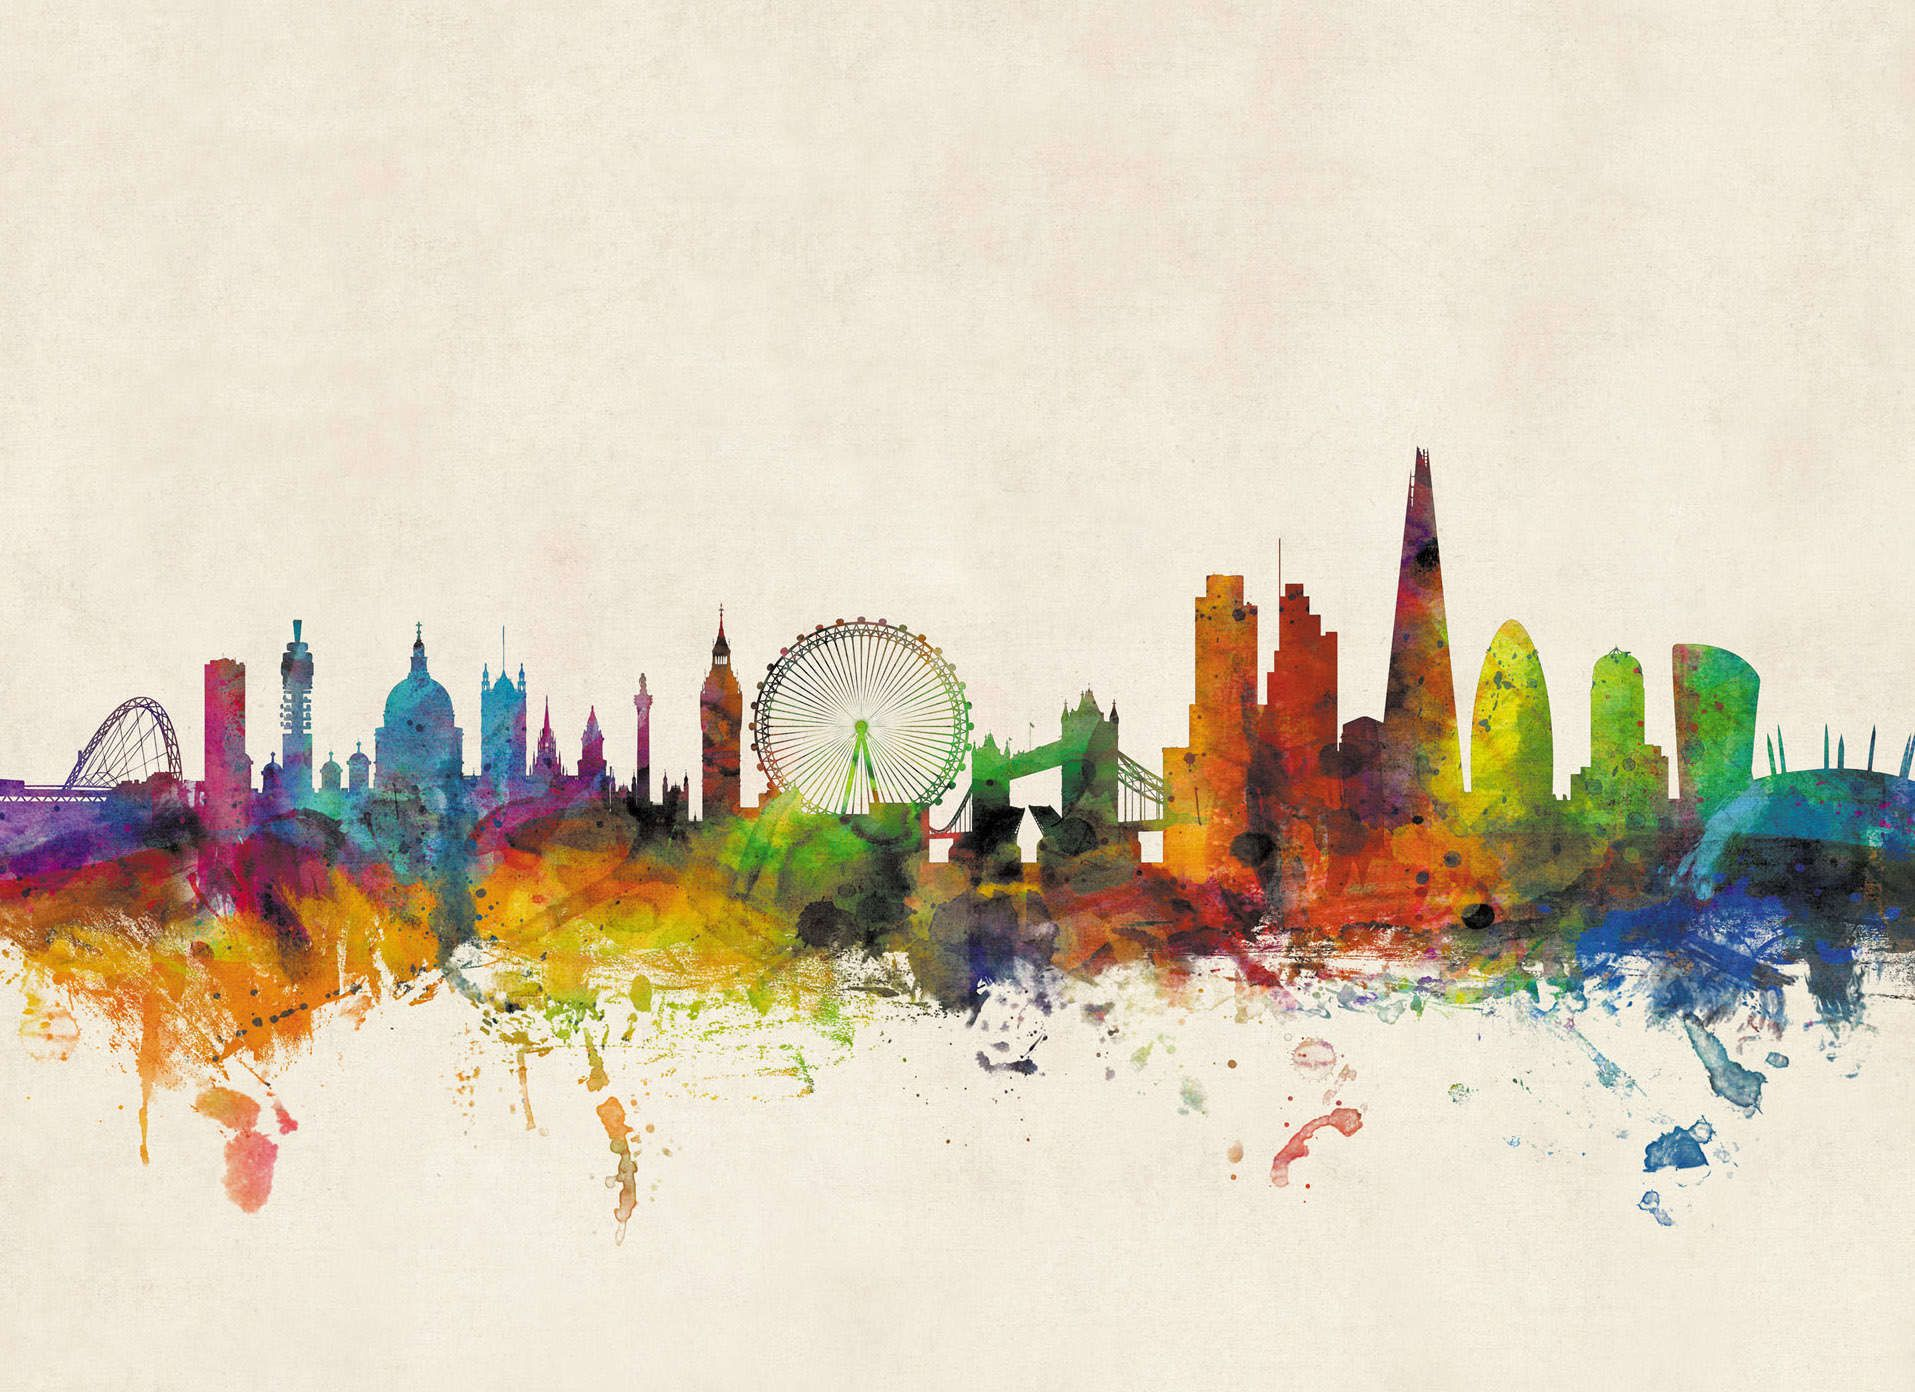 1915x1392 London City Skyline